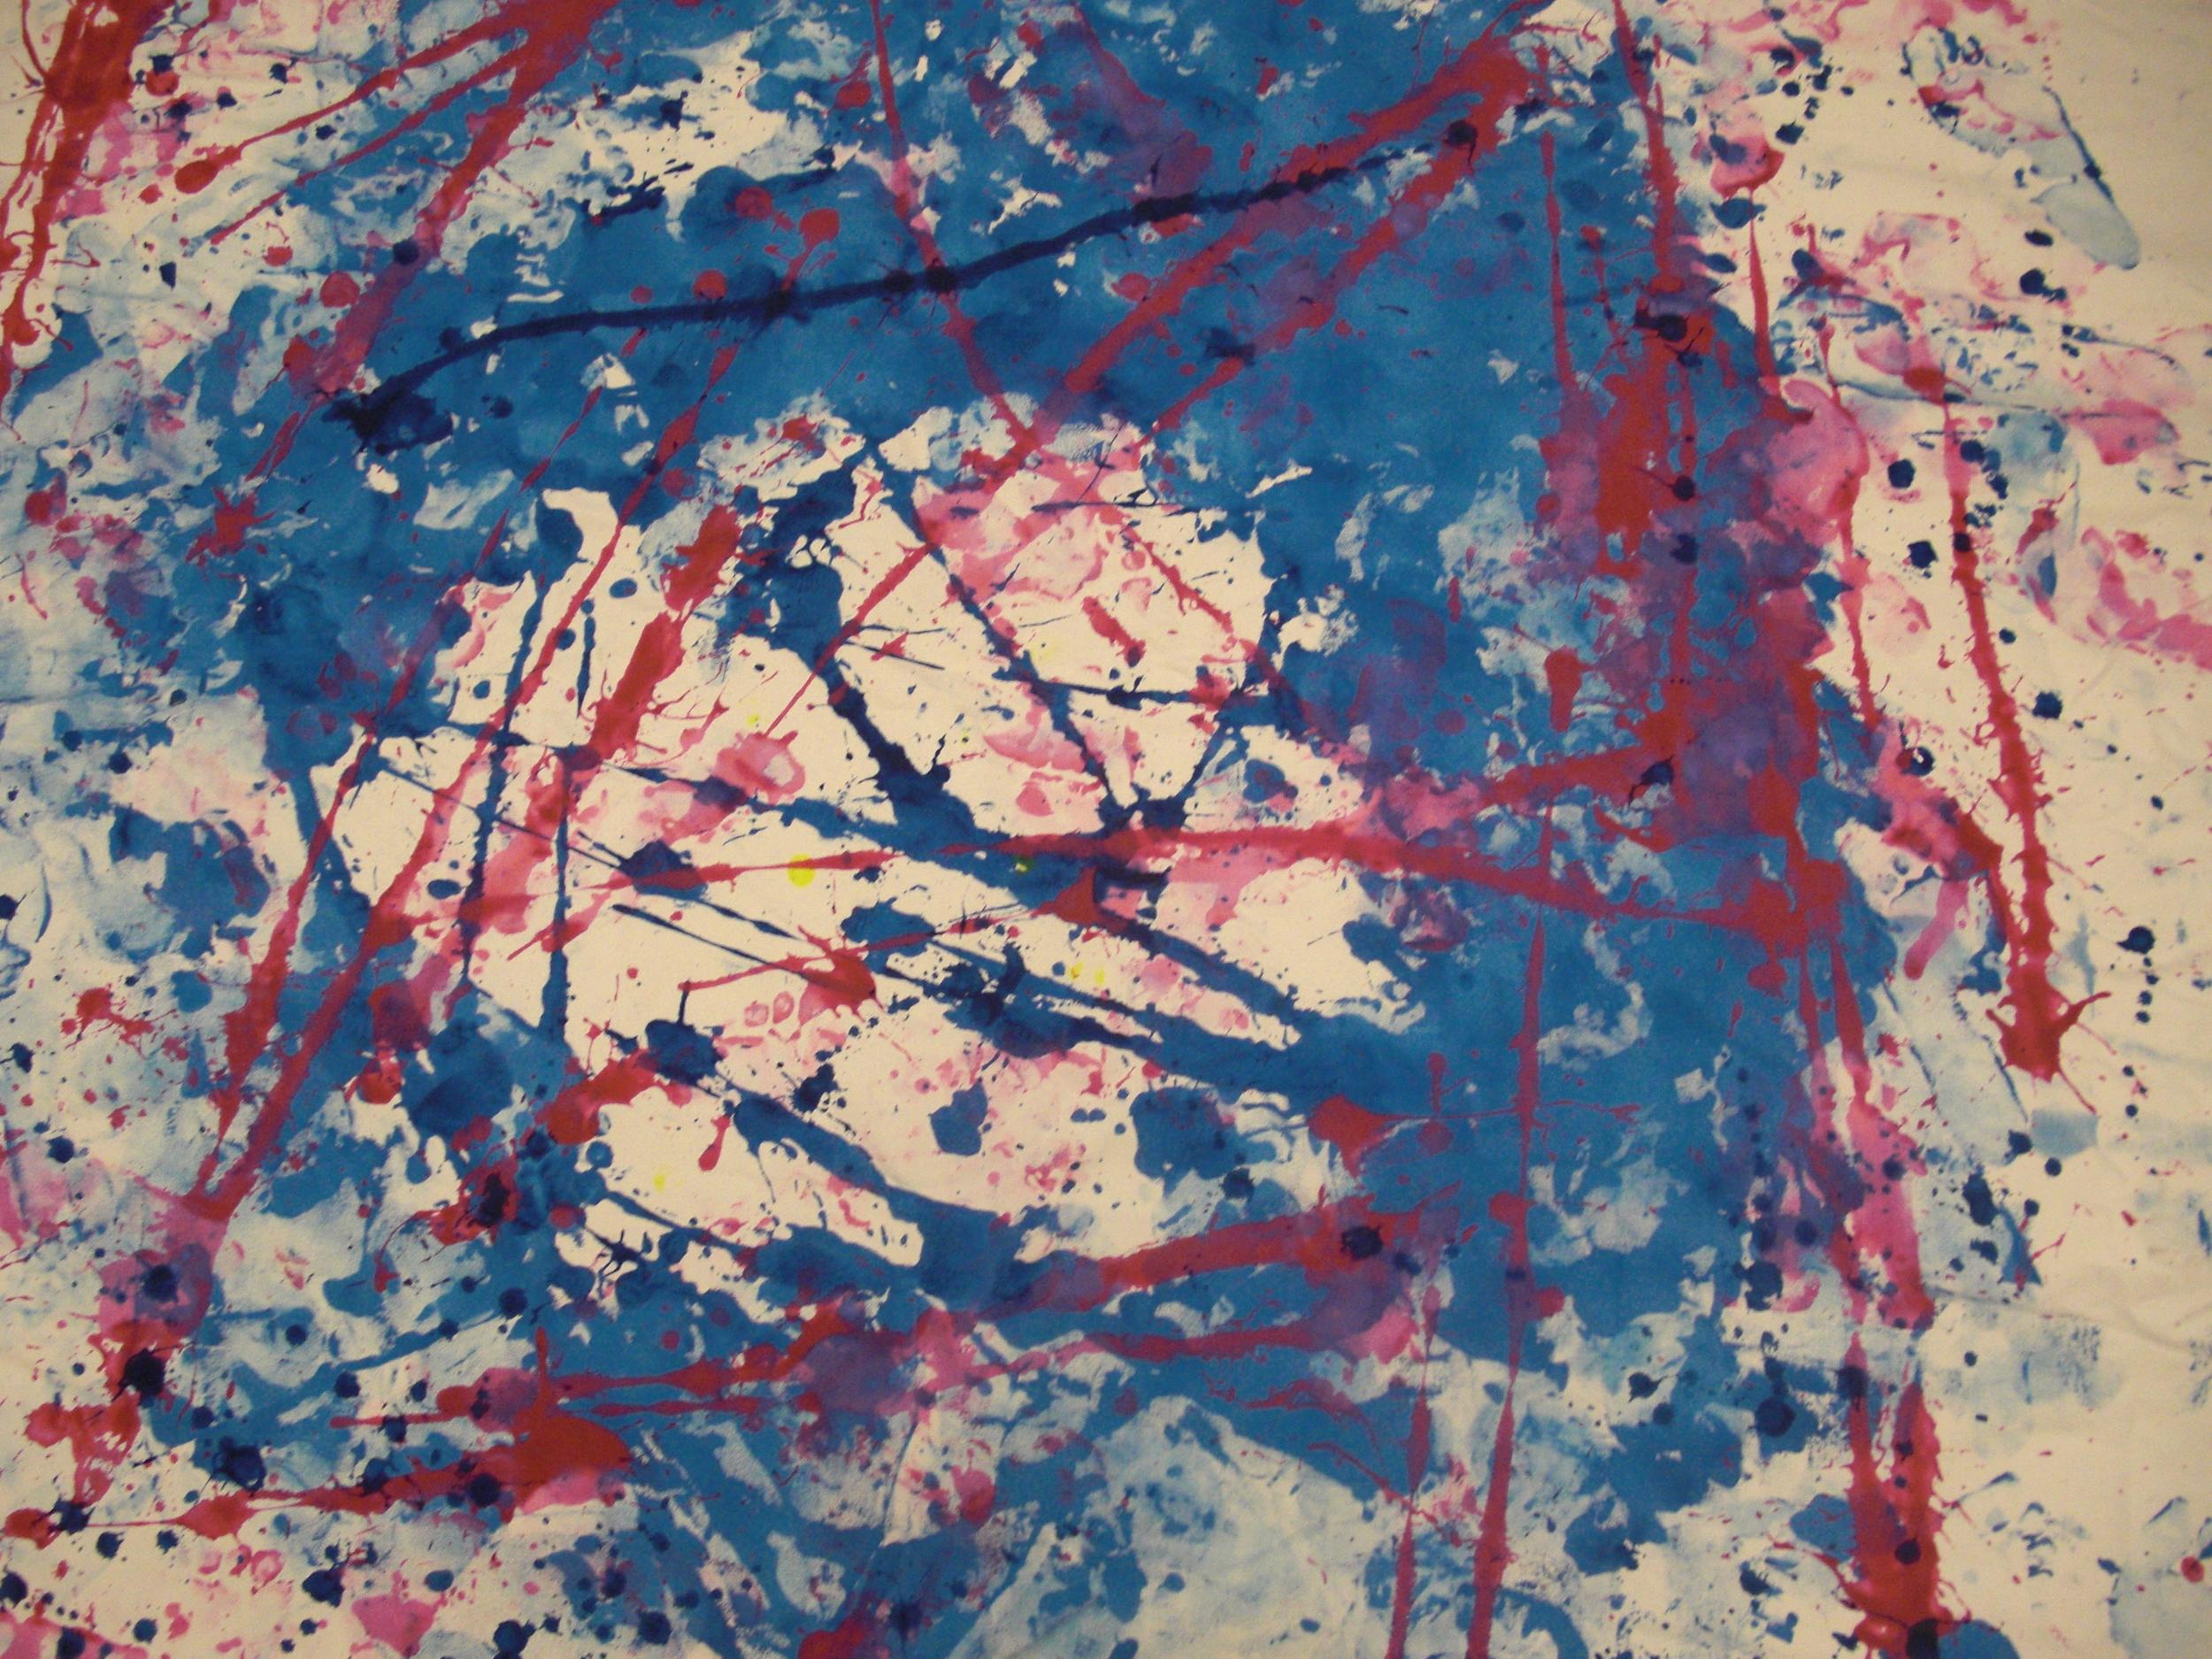 Dance #1, tempera on canvas, 5'x6', 2010